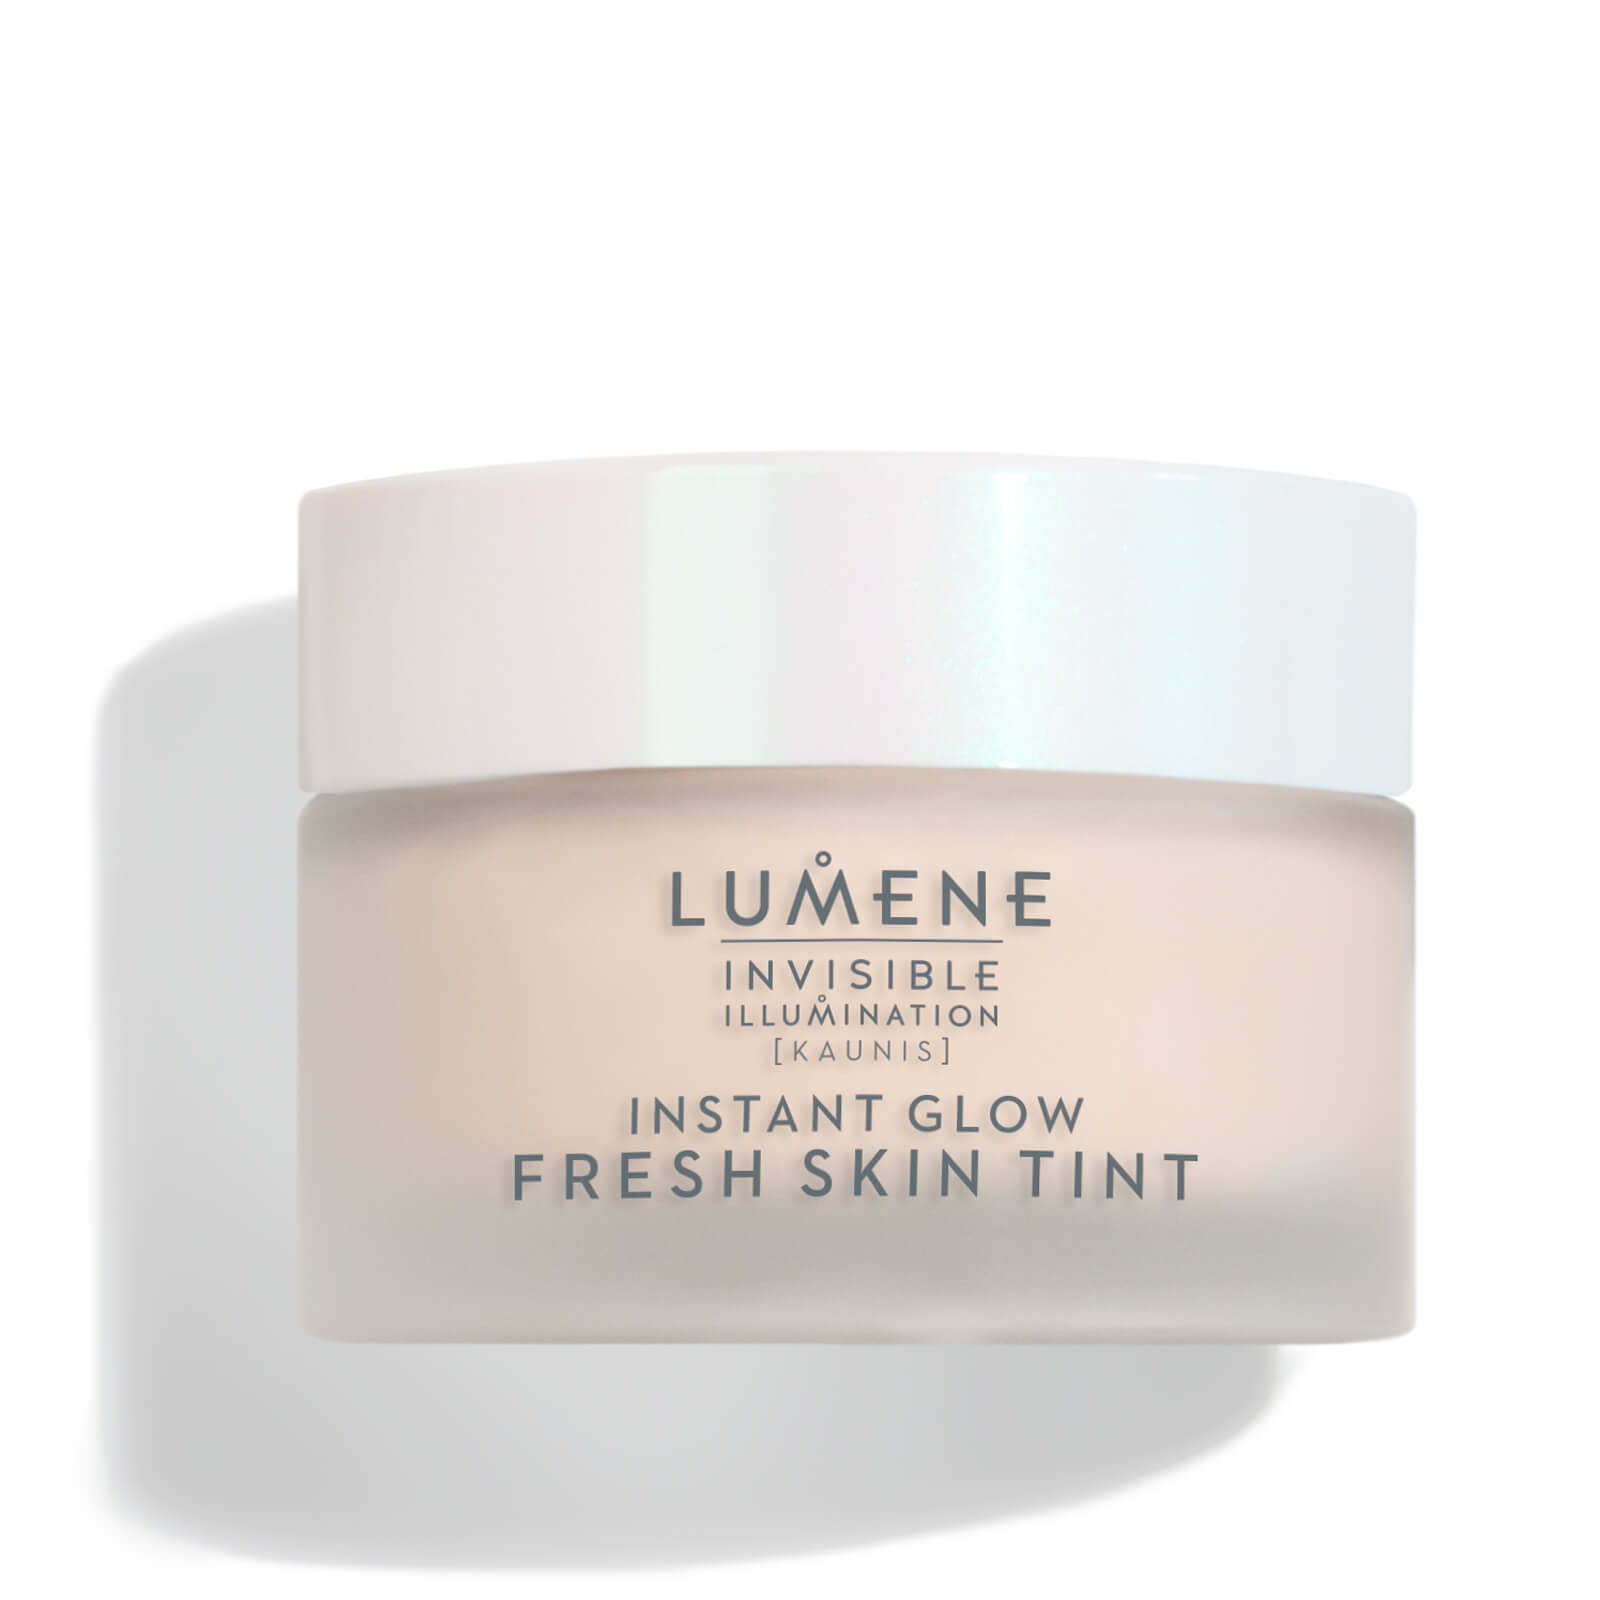 Lumene Fresh Skin Tint